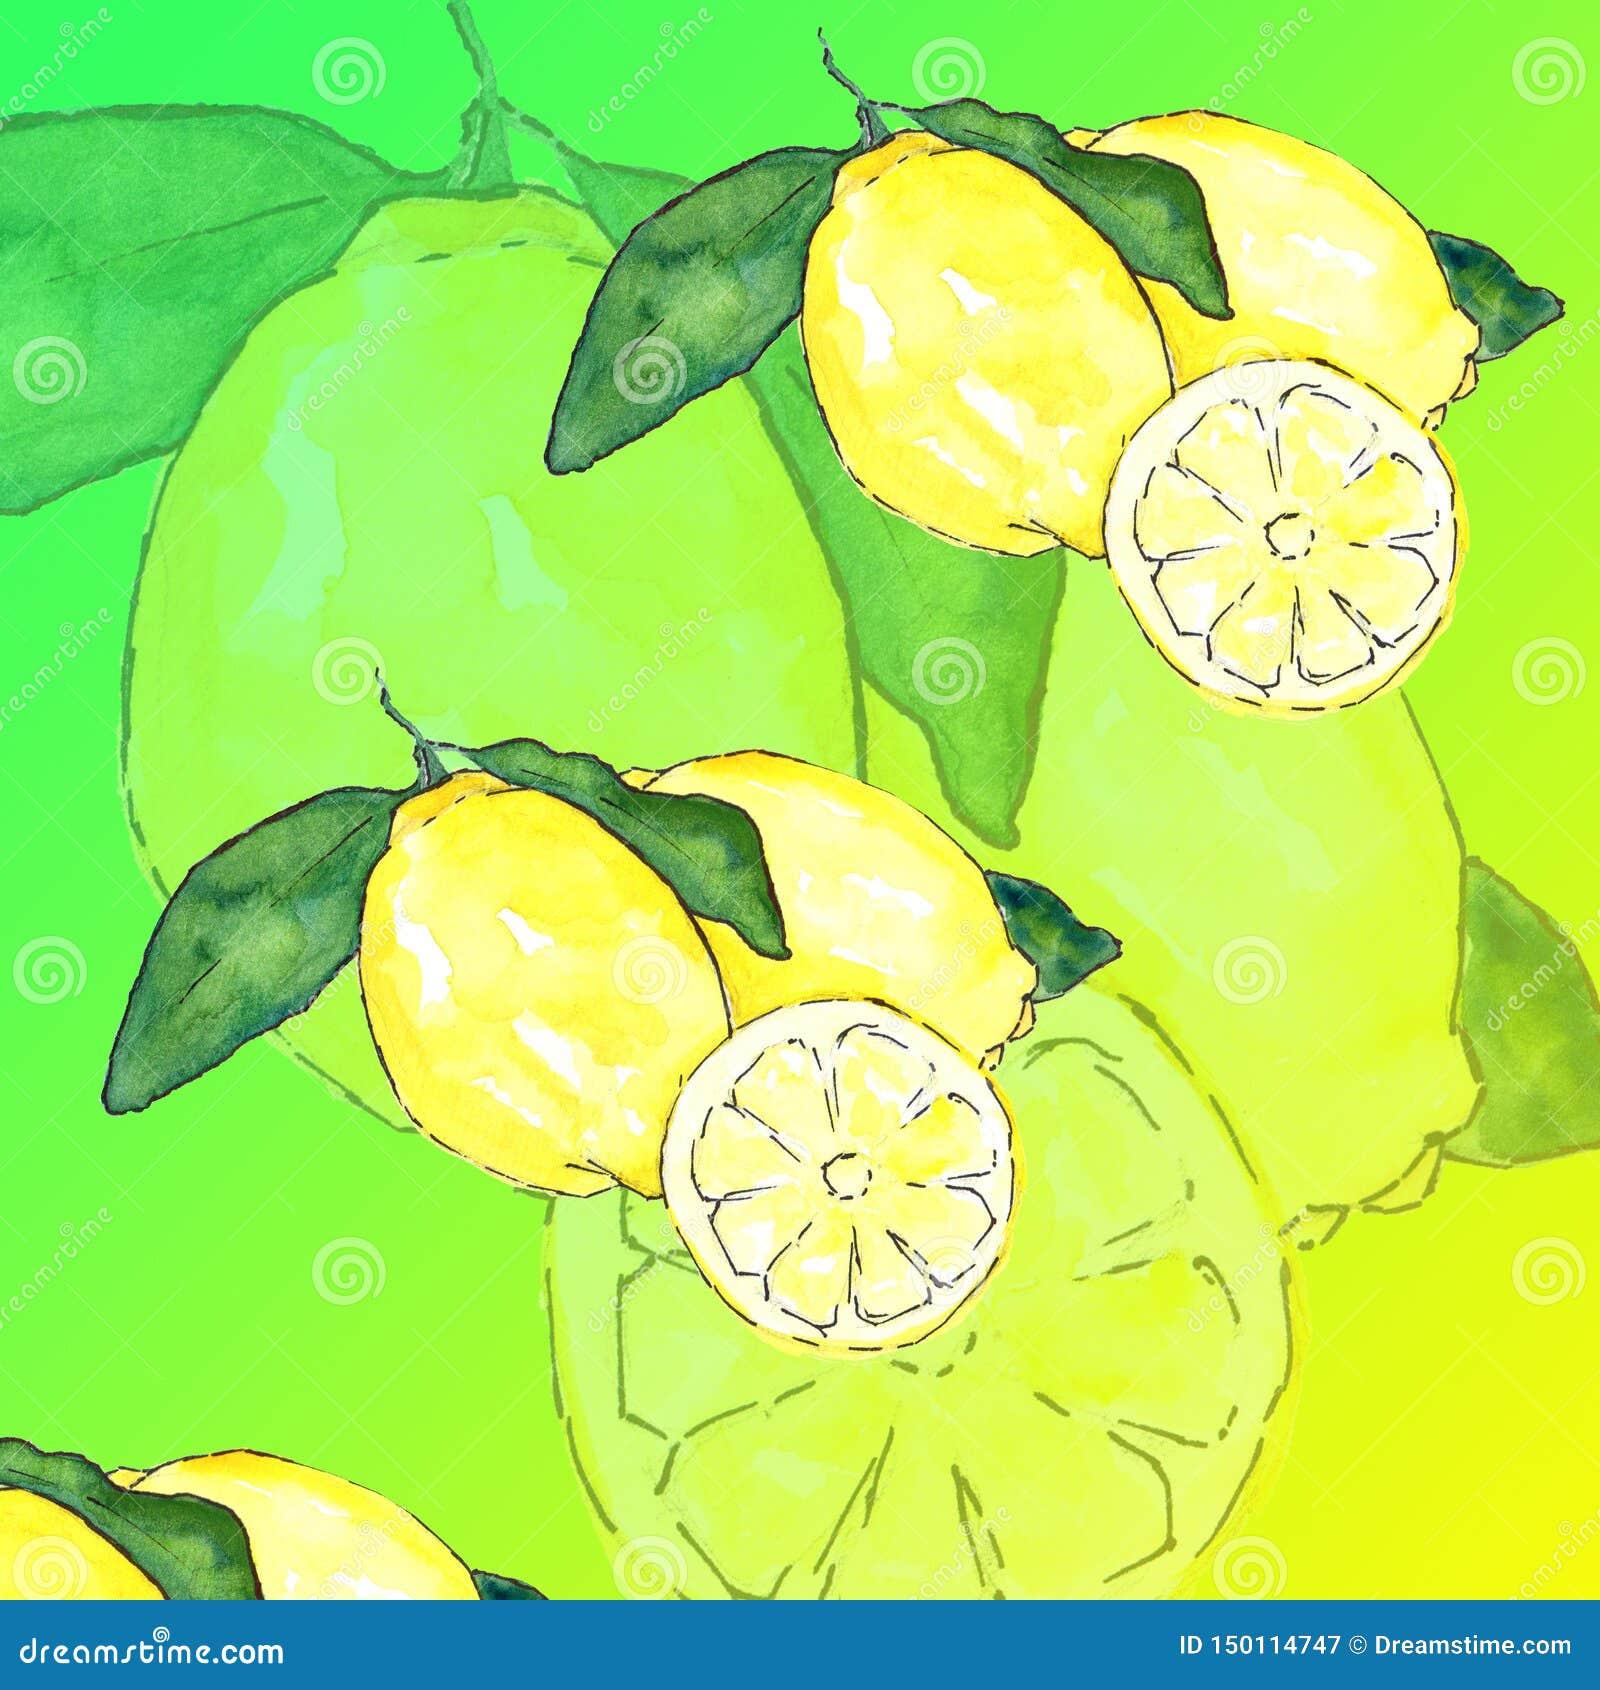 Summer Digital Paper Pack: `Tutti Frutti` Tropical Fruits Background Pineapple Lemon Lemonade Watermelon Paper Colorful Summer